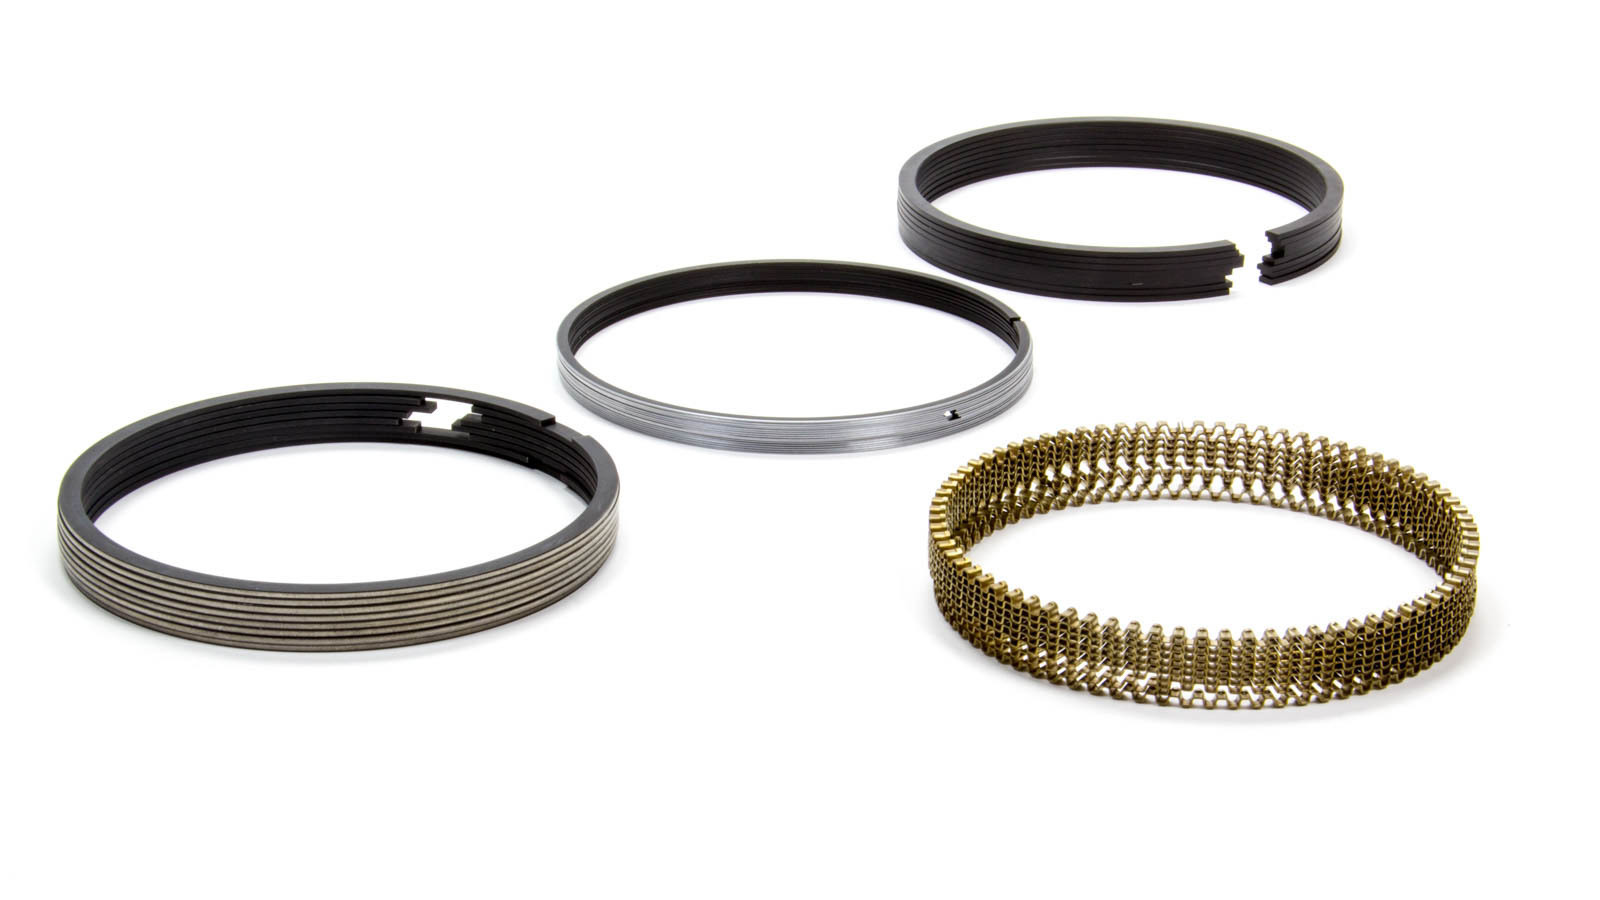 Piston Ring Set 4.125 Classic 1/16 1/16 3/16